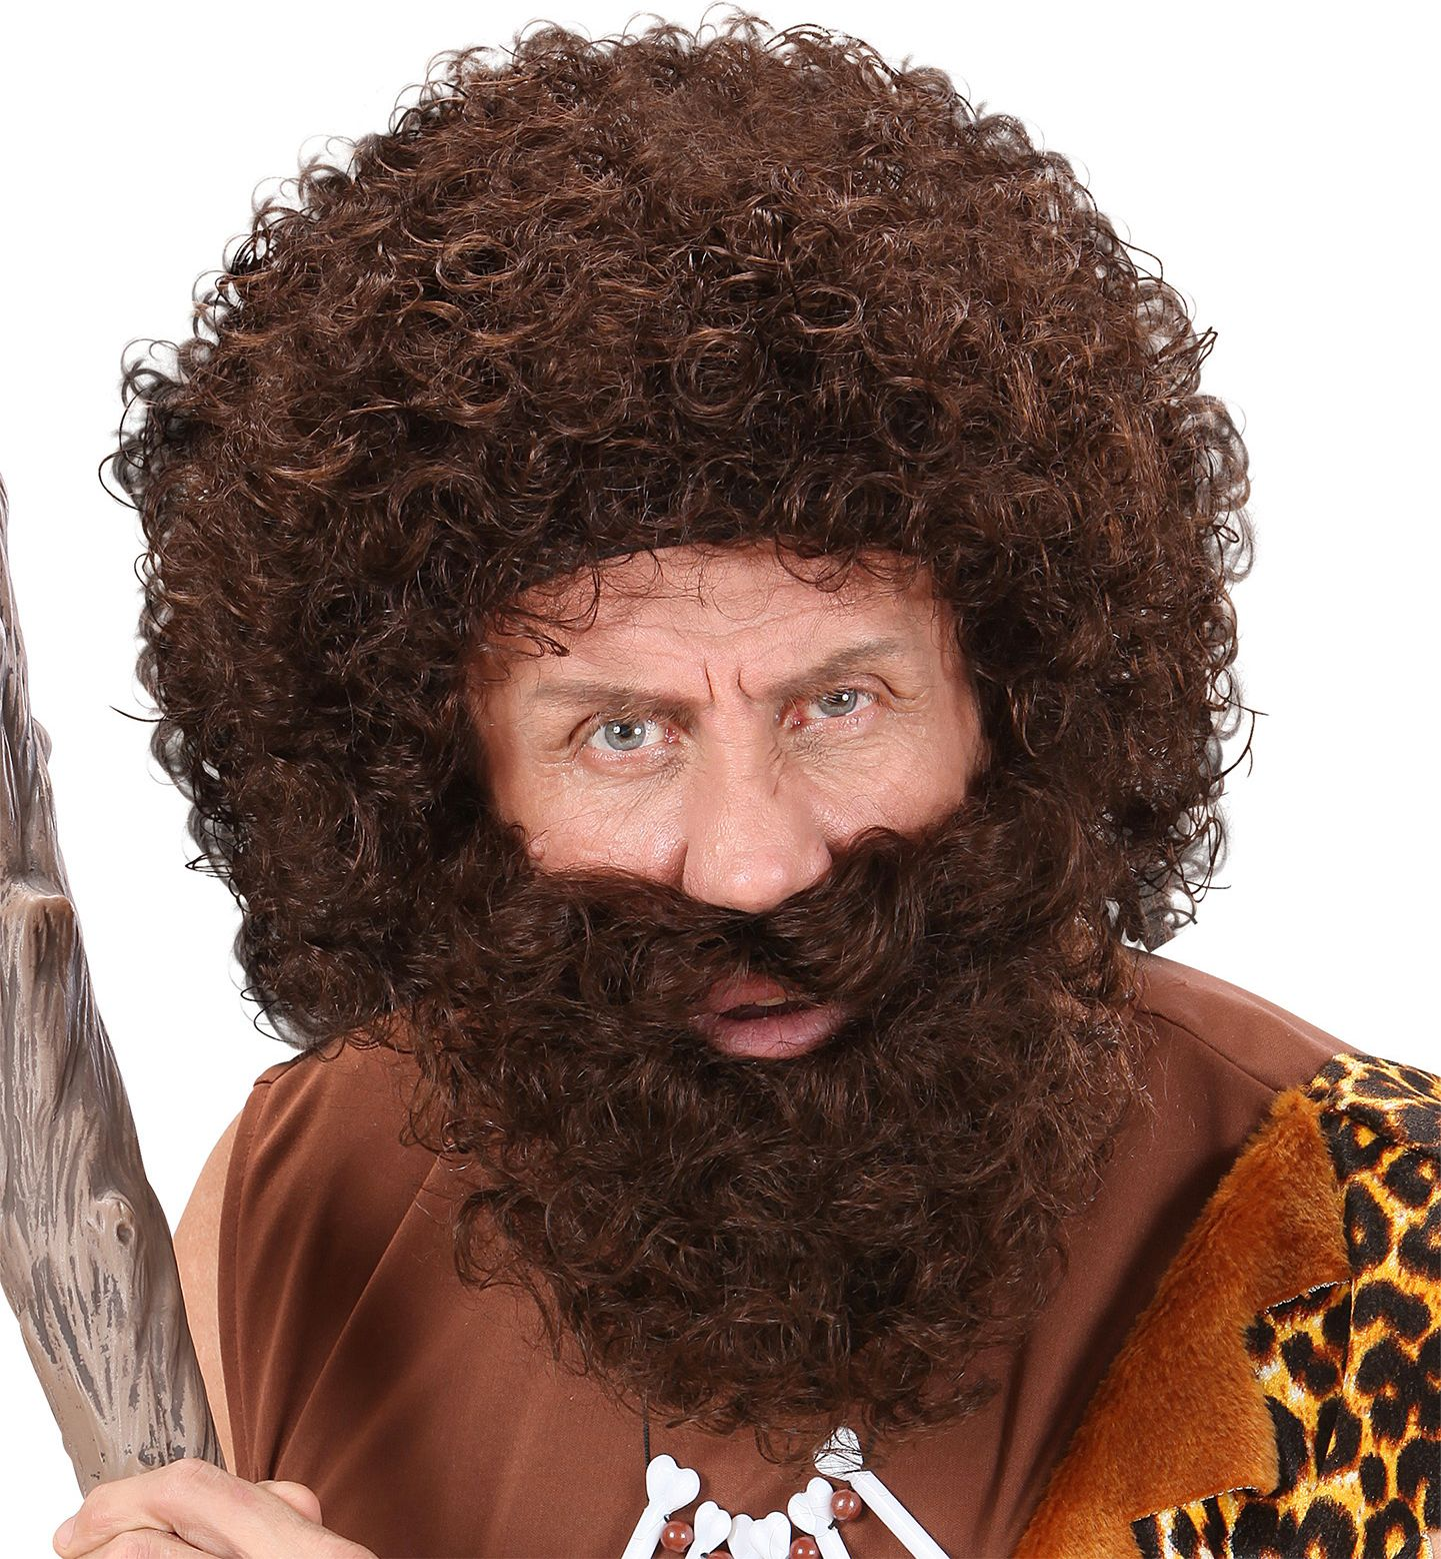 Bruine pruik met snor en baard